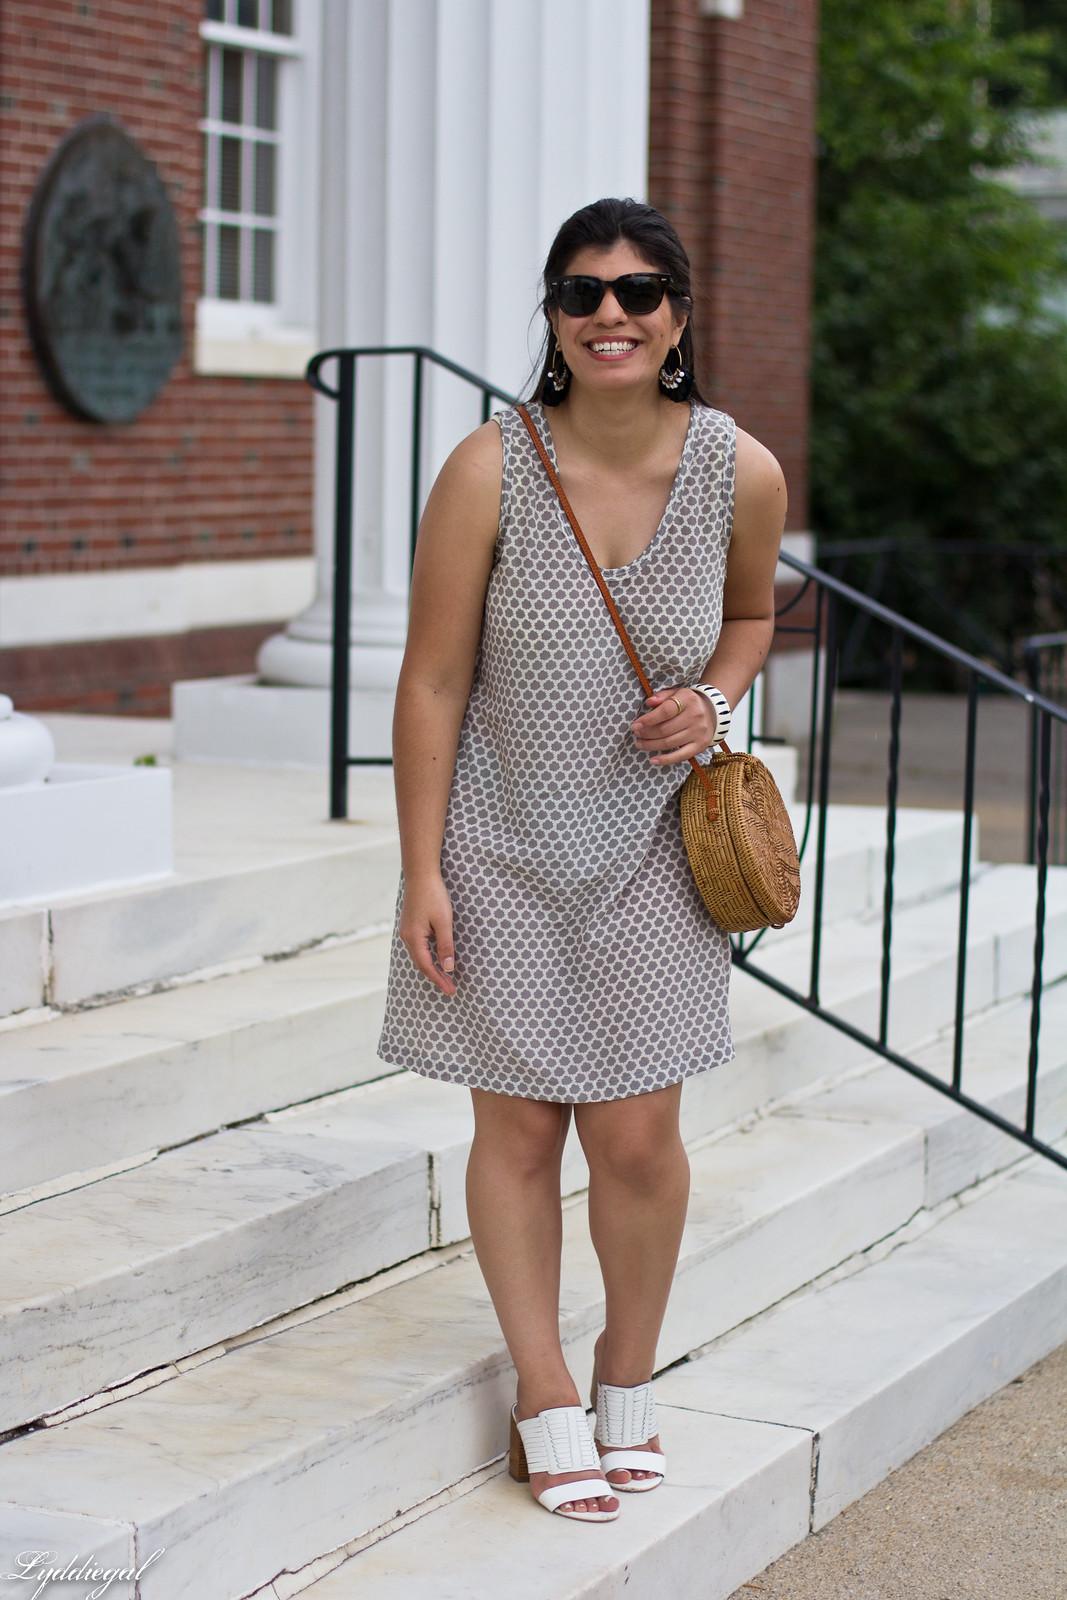 joie cloudburst dress, round straw bag, statement earrings-3.jpg